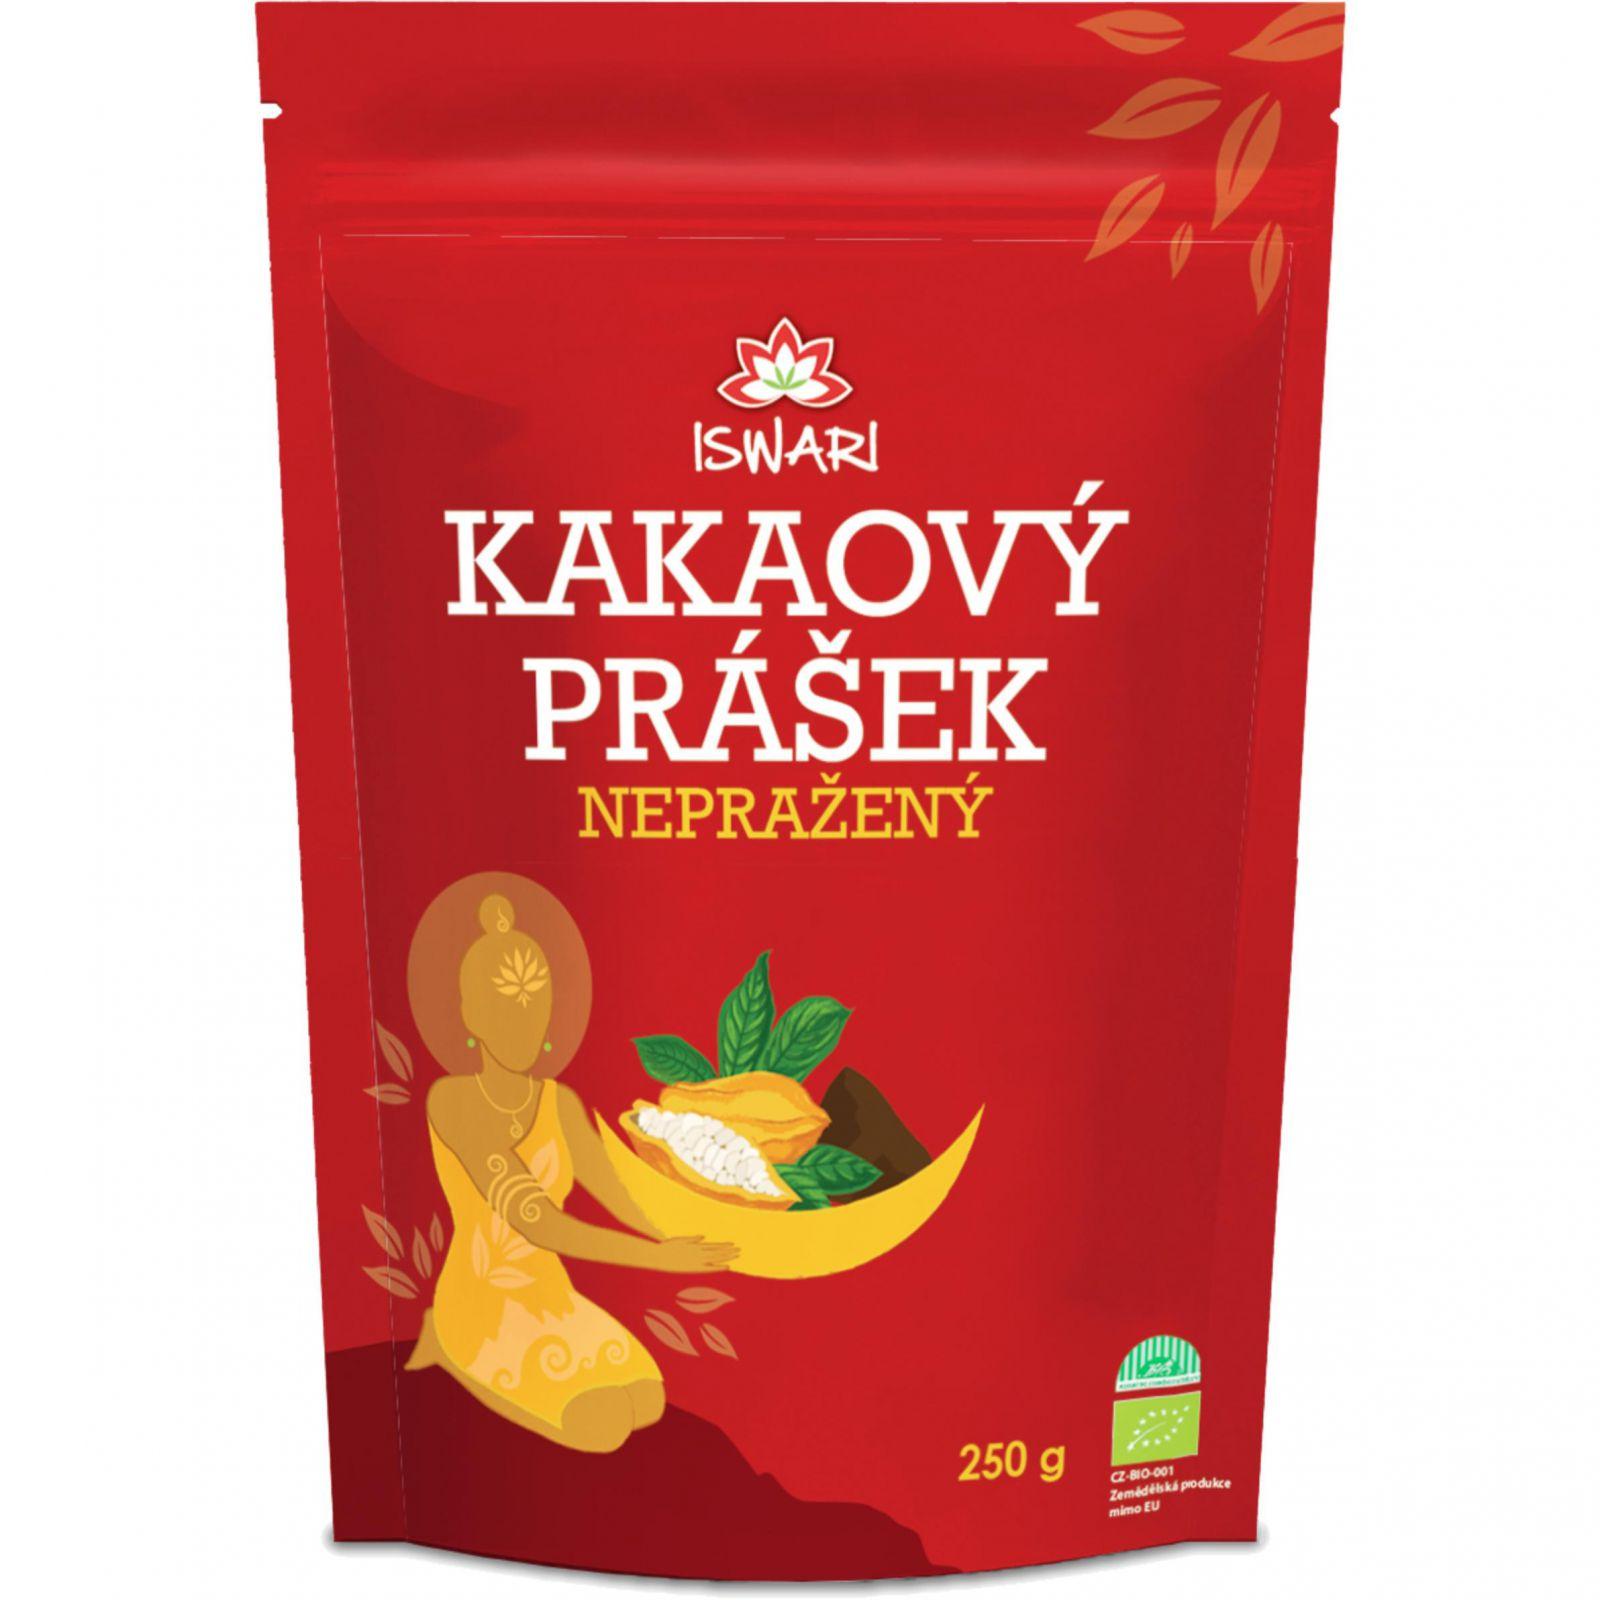 Iswari Nepražené kakao prášek 250 g